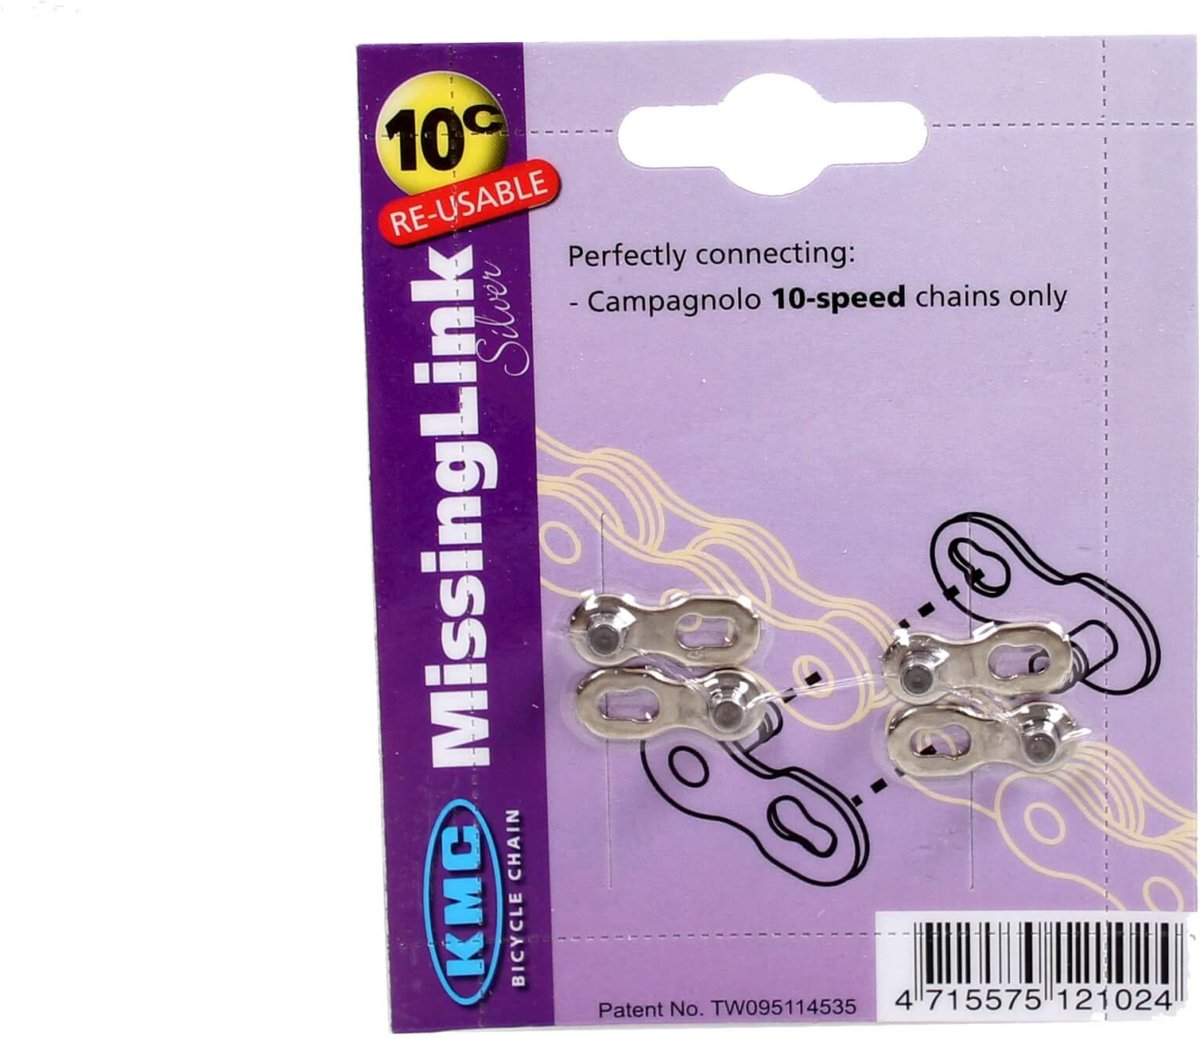 KMC Missinglink - Kettingschakel - 10-Speed - Campagnolo - (2 stuks) kopen